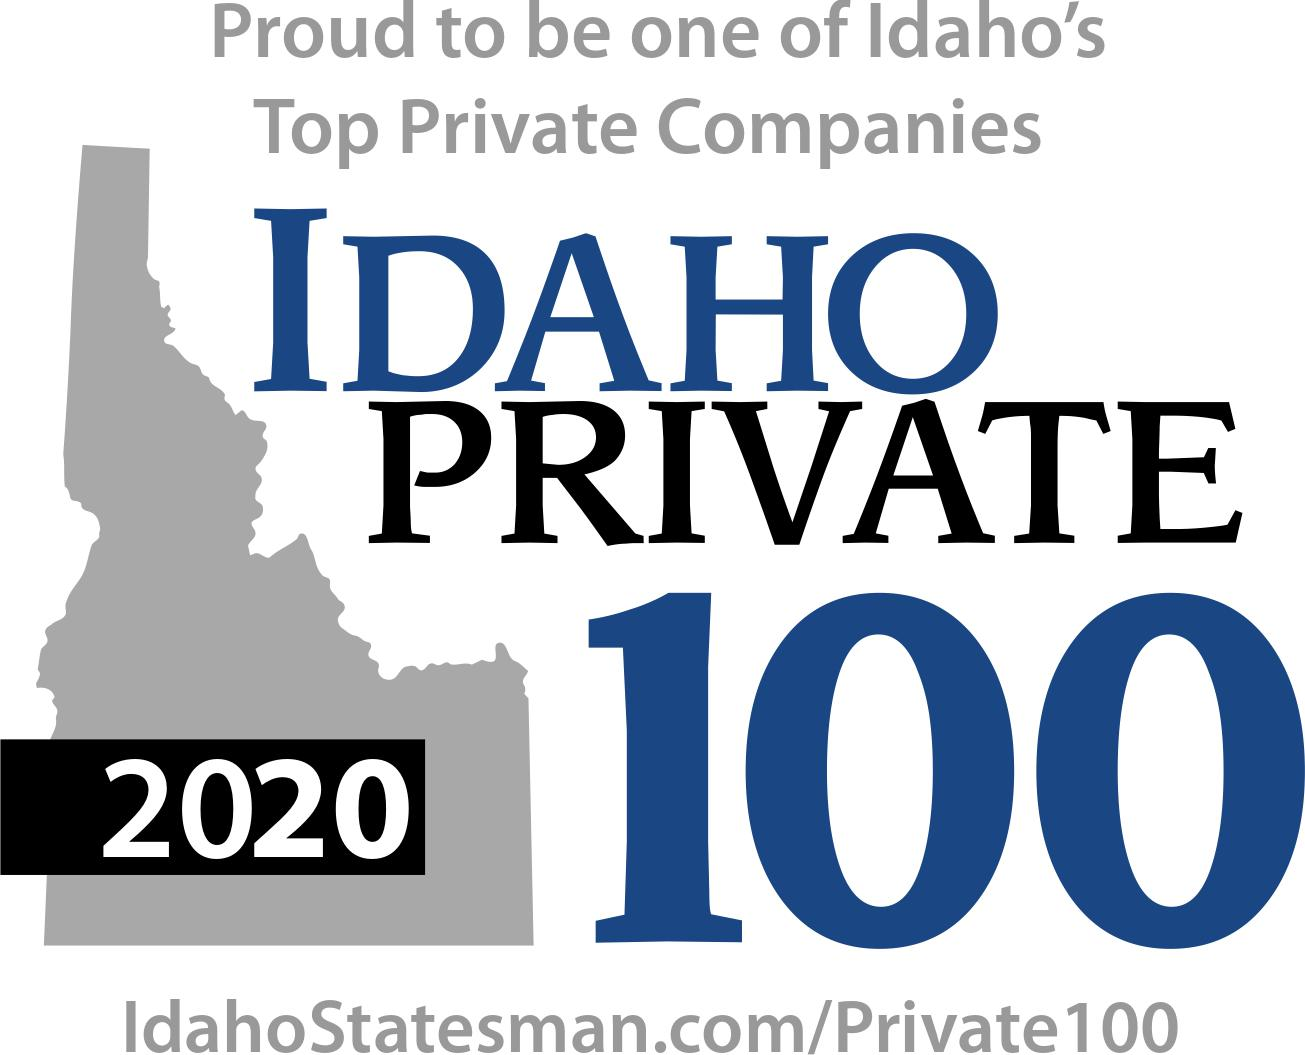 Top Private 100 Idaho